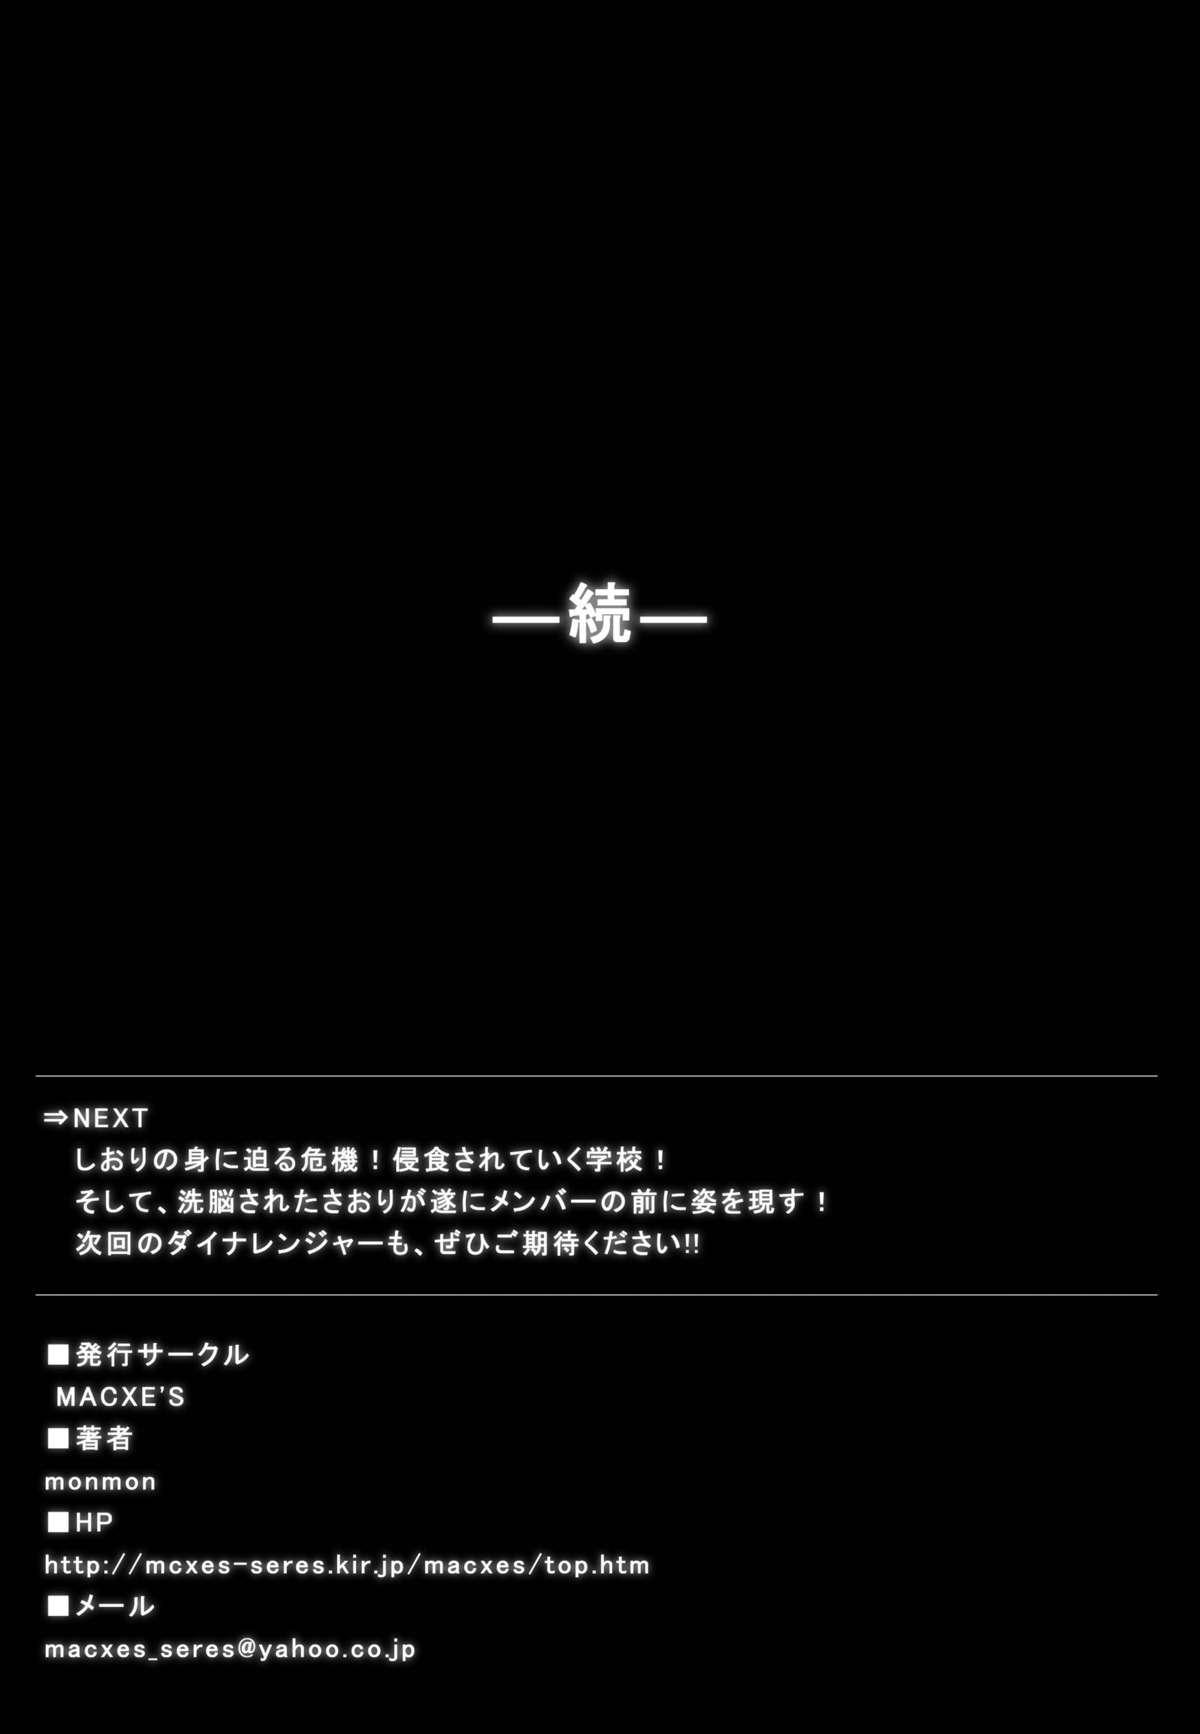 [Macxe's (monmon)] Tokubousentai Dinaranger ~Heroine Kairaku Sennou Keikaku~ Vol.01/02/03 (Renkaban) [Digital] 86